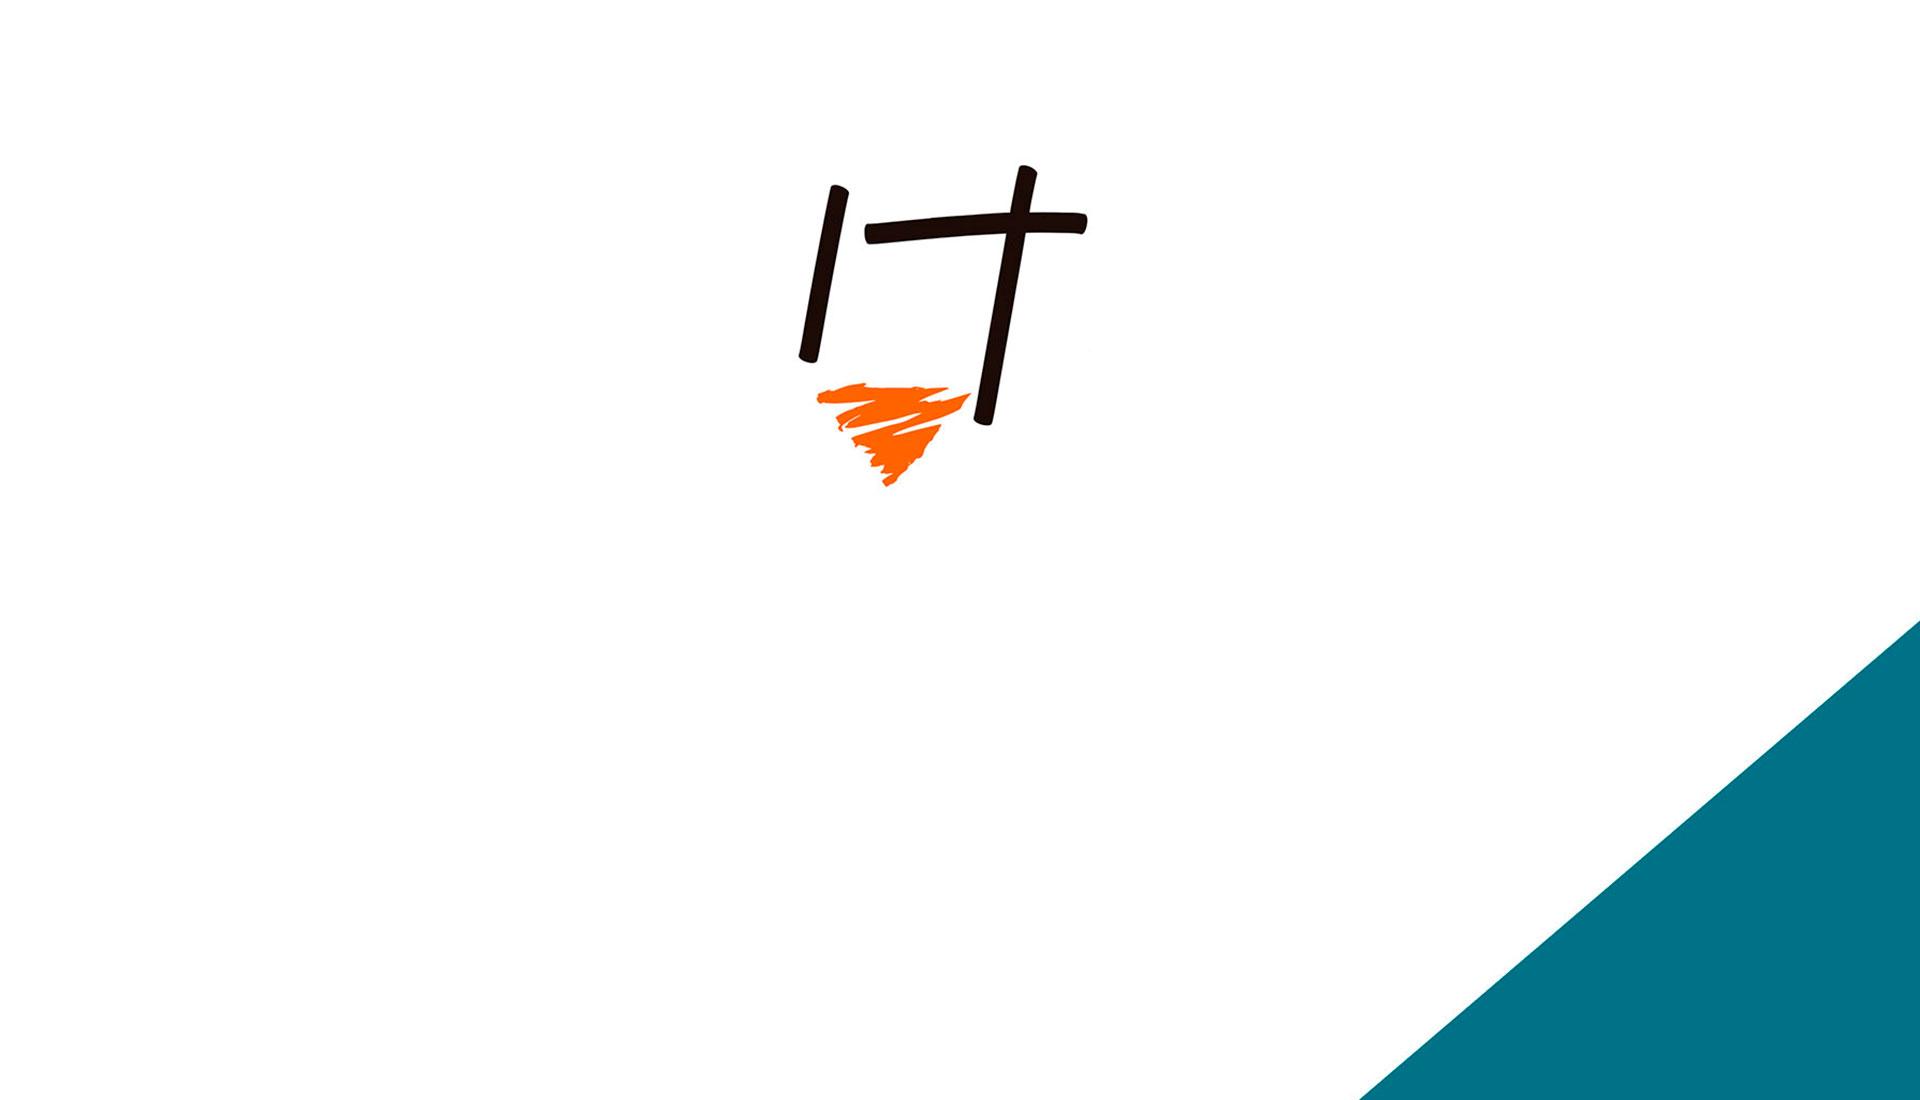 agencia-marketing-digital-pennyworth-identidad-corporativa-restaurante-valencia-12